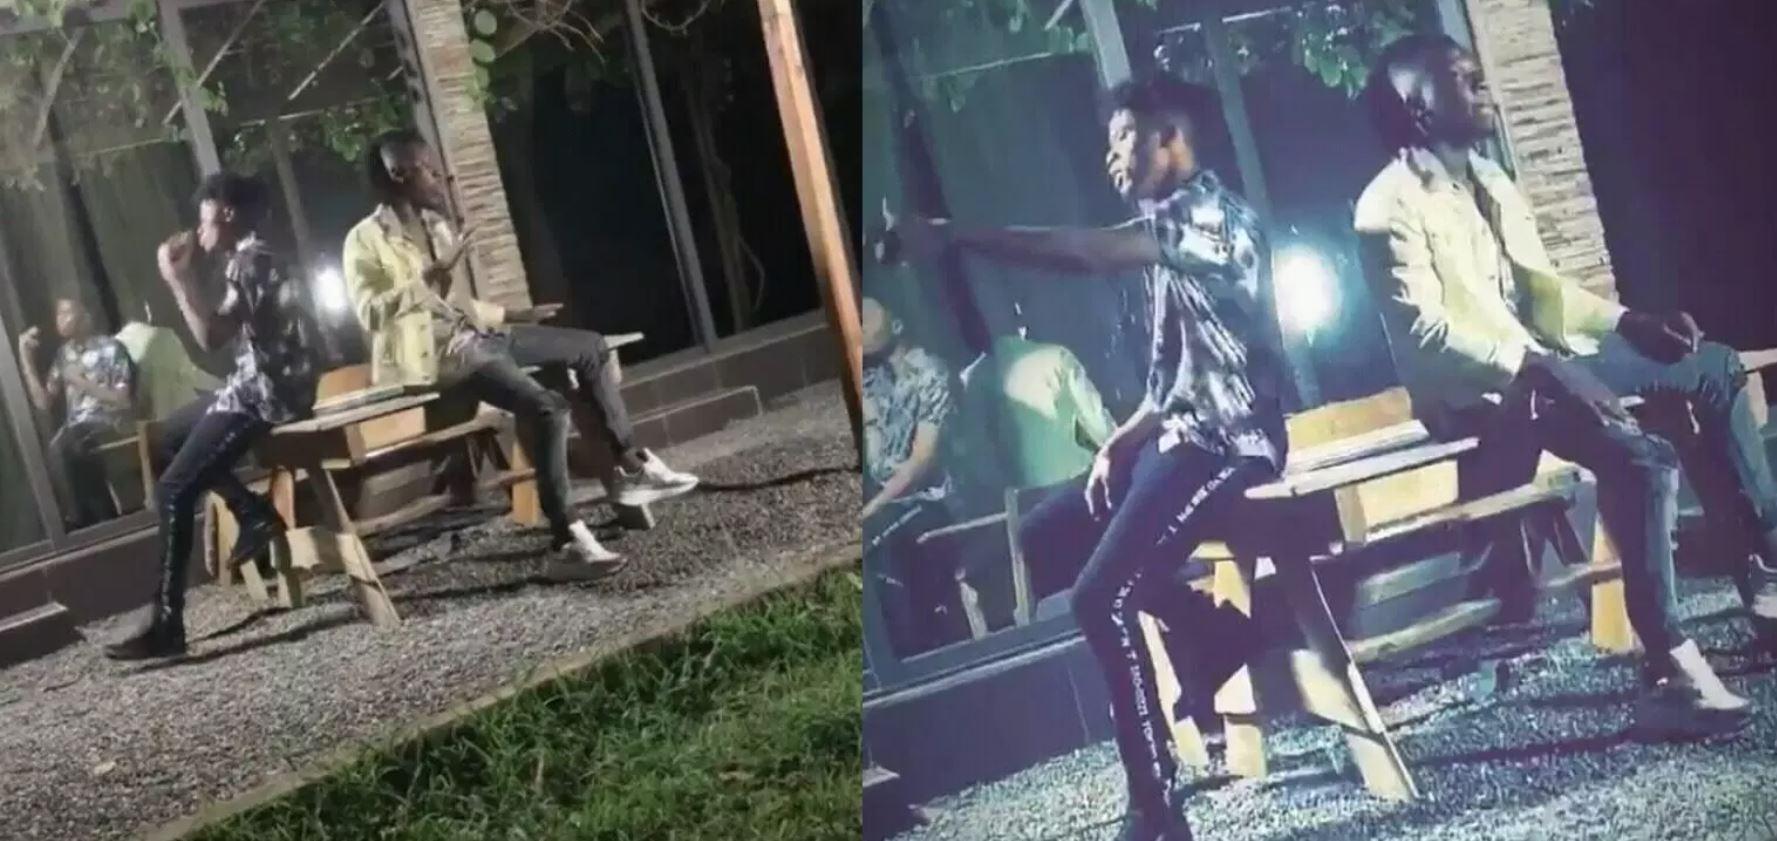 Kwesi Arthur & Stonebwoy shooting a dope music video together